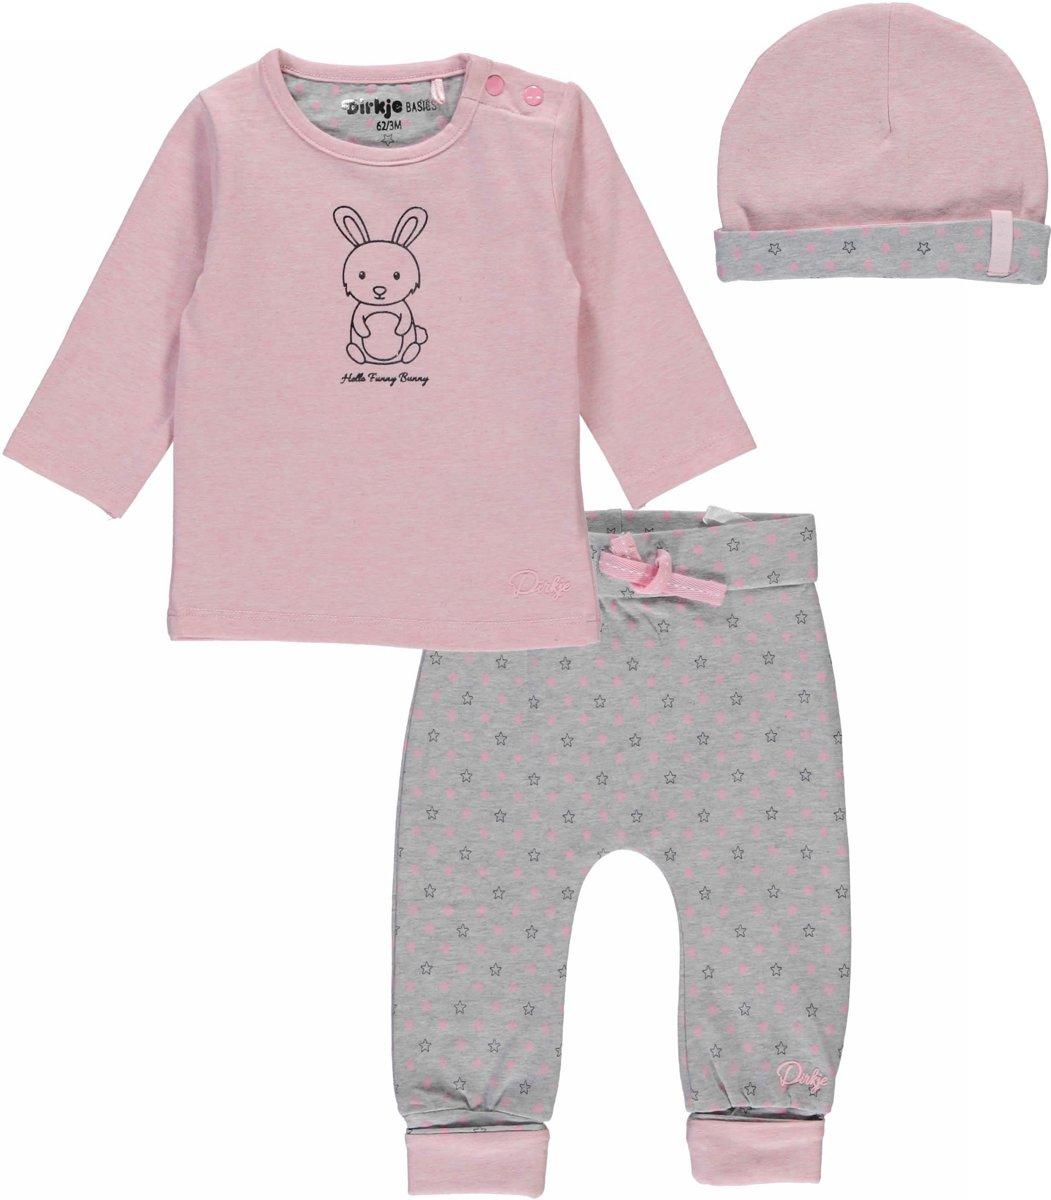 Cosy Pyjamas – My Chi and Me